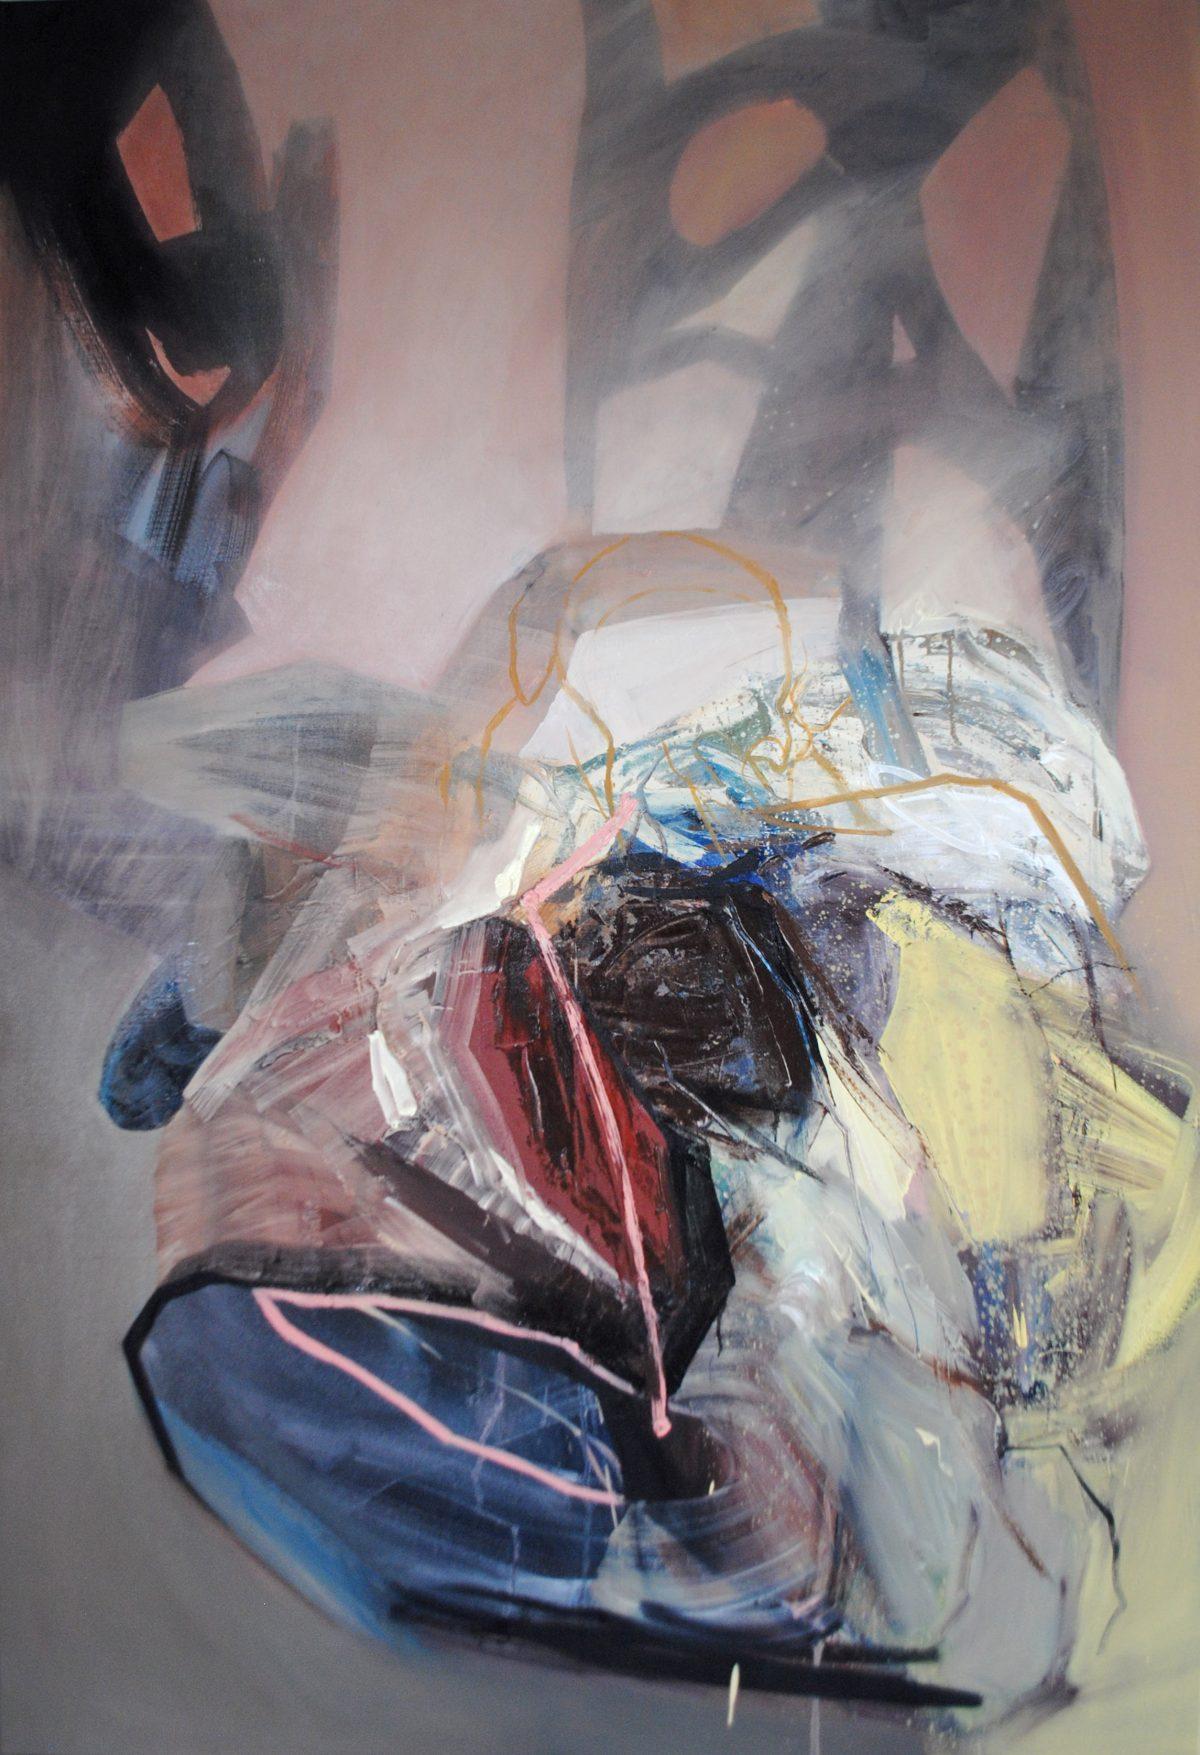 Fragments 7, acrylic and oil on canvas, 2019, 100x150 cm